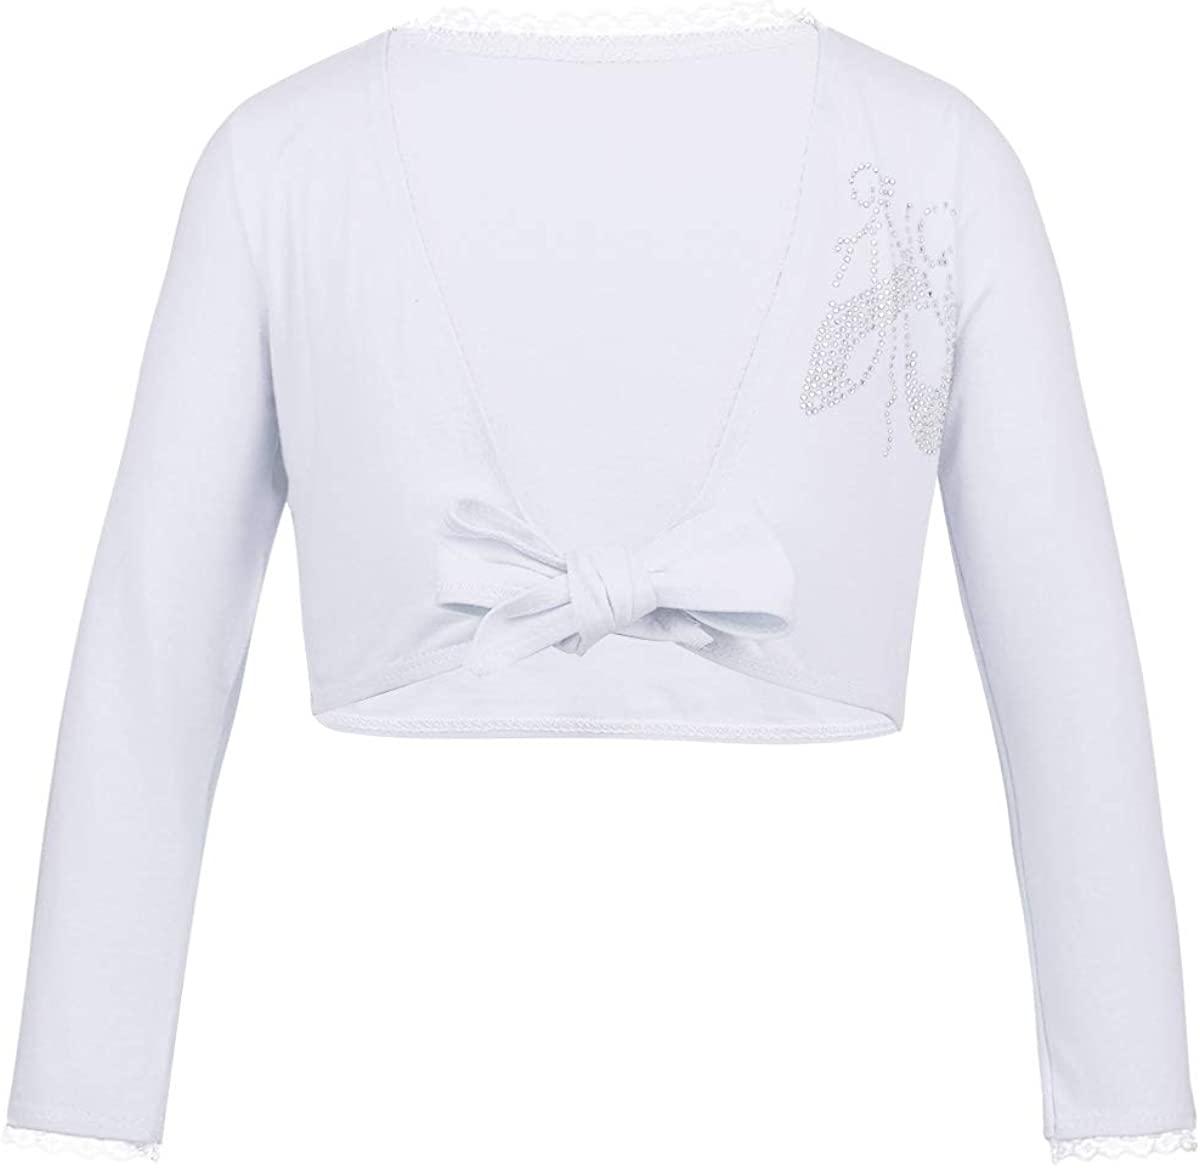 ranrann Kids Girls Ballet Dance Long Sleeves Cotton Wrap Top Front Knot Gymnastic Short Cardigan